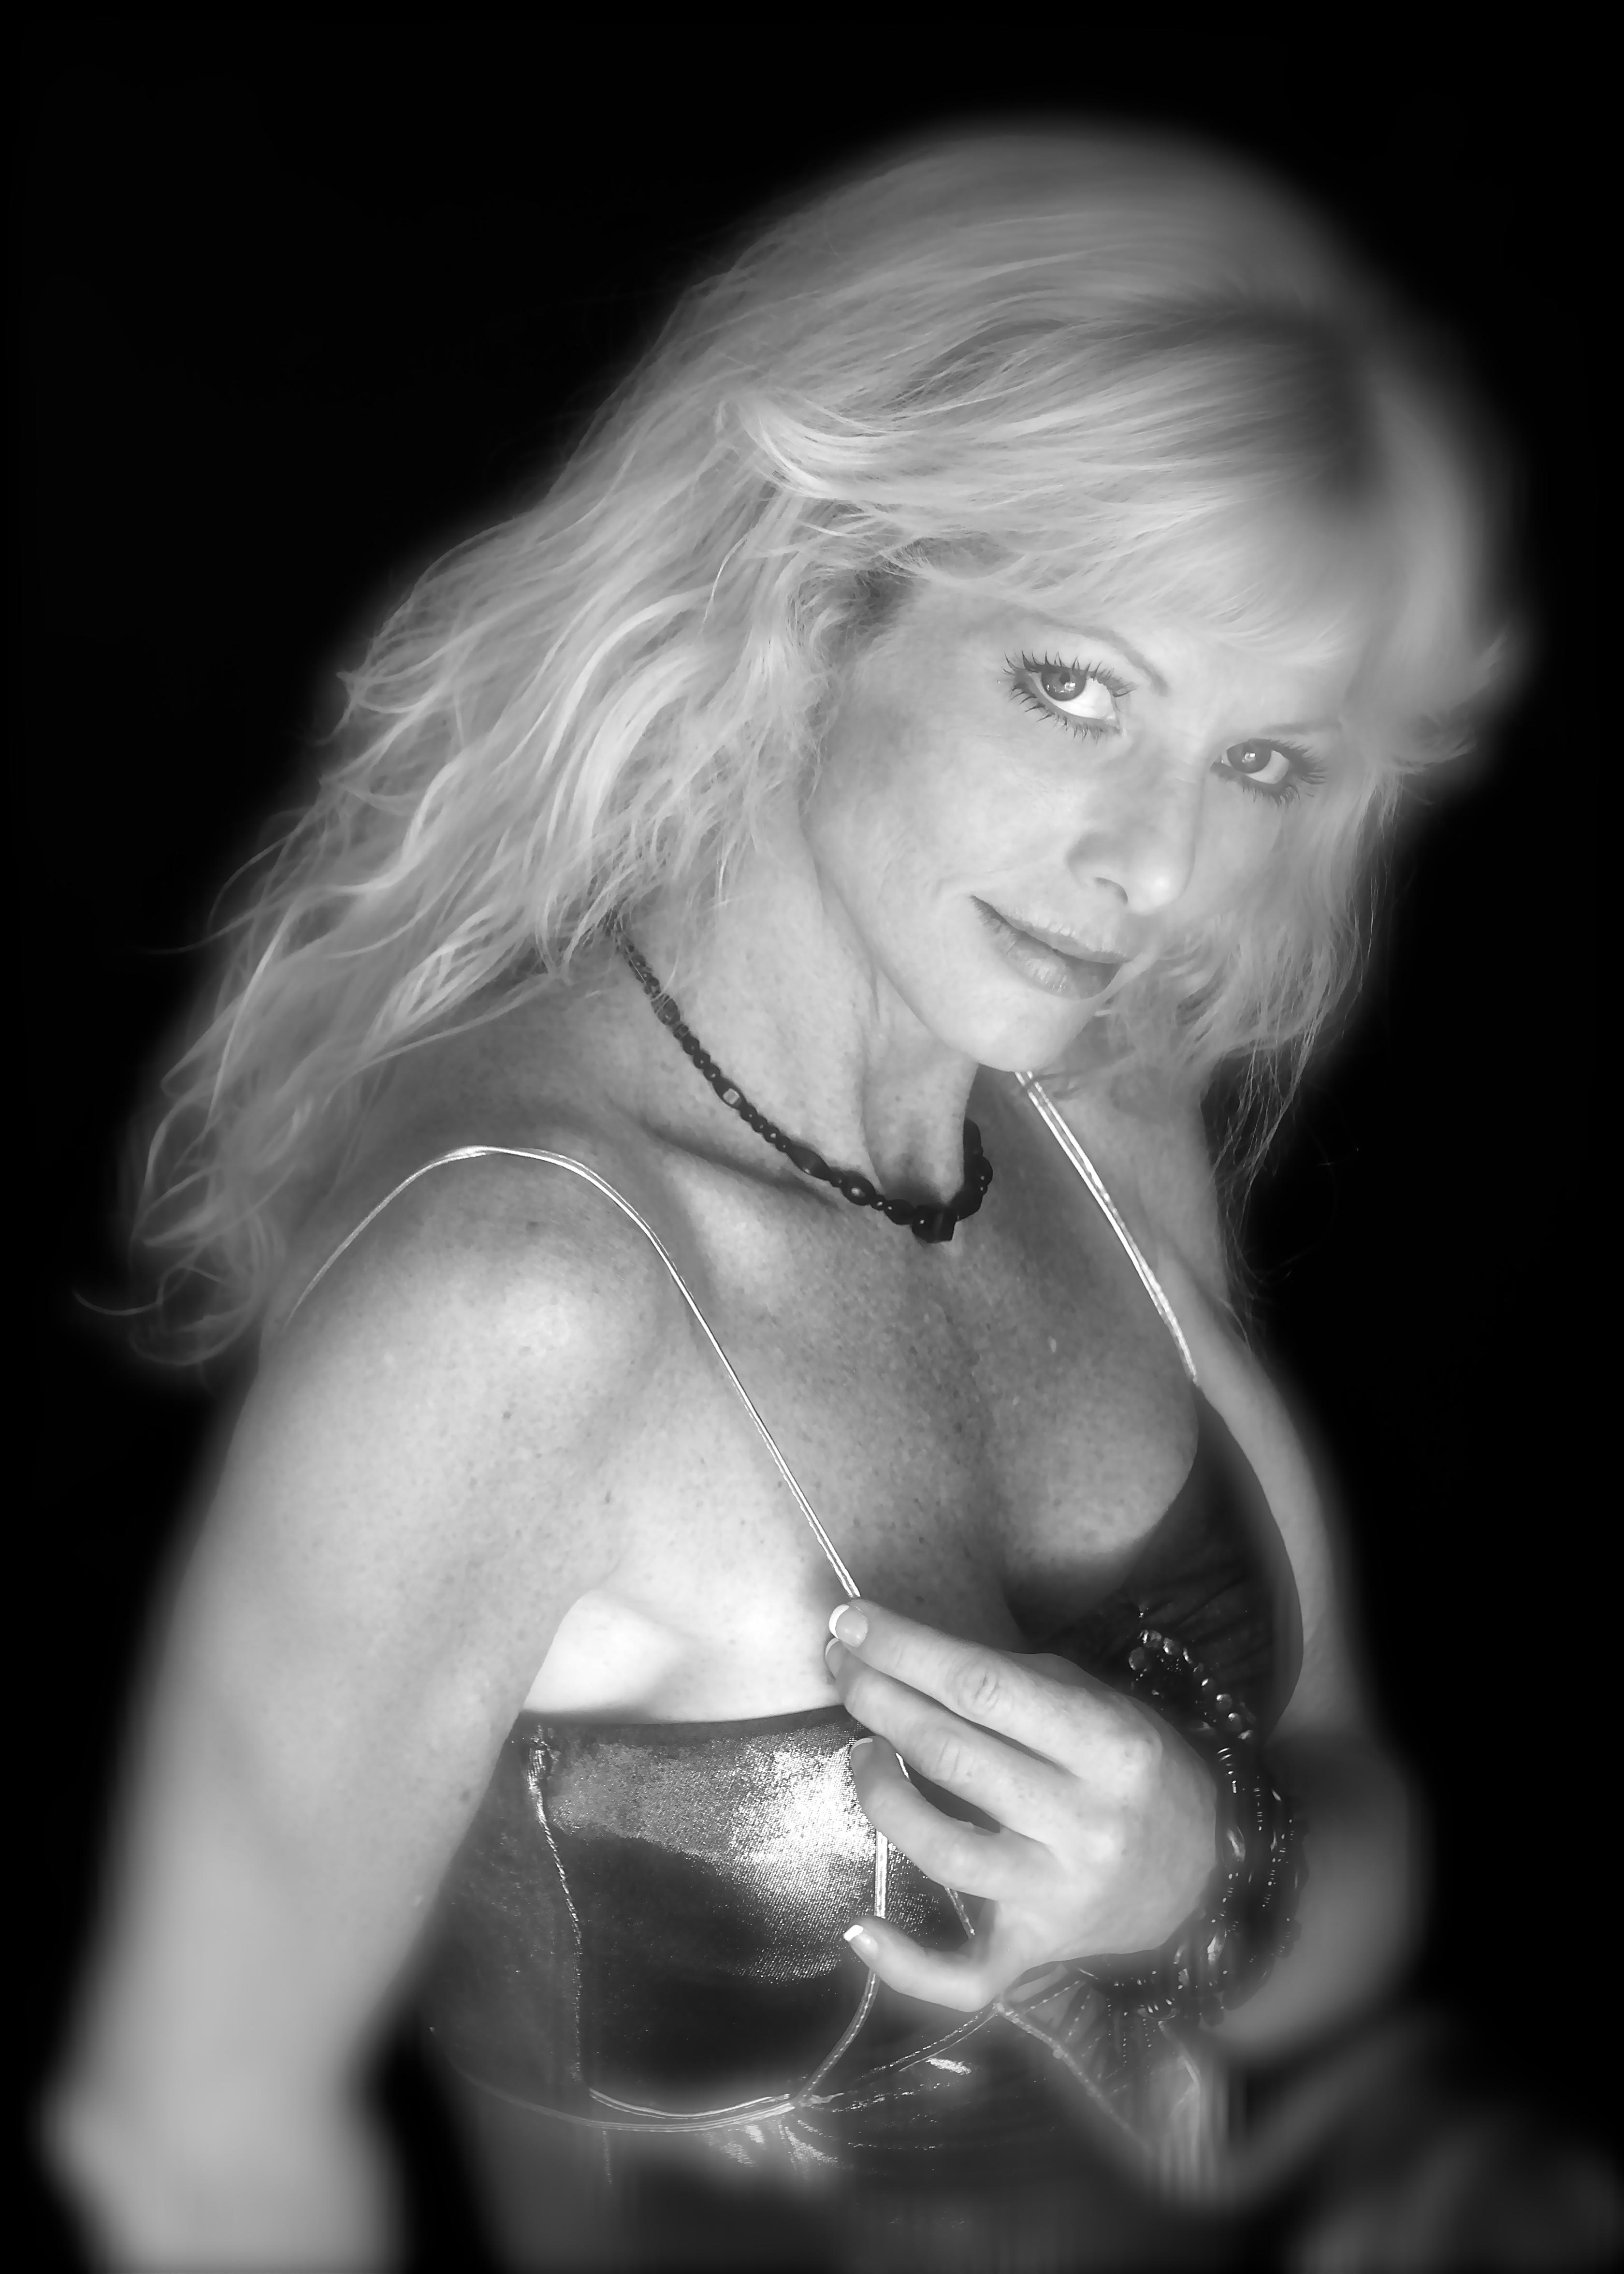 boudoir photography_3139a